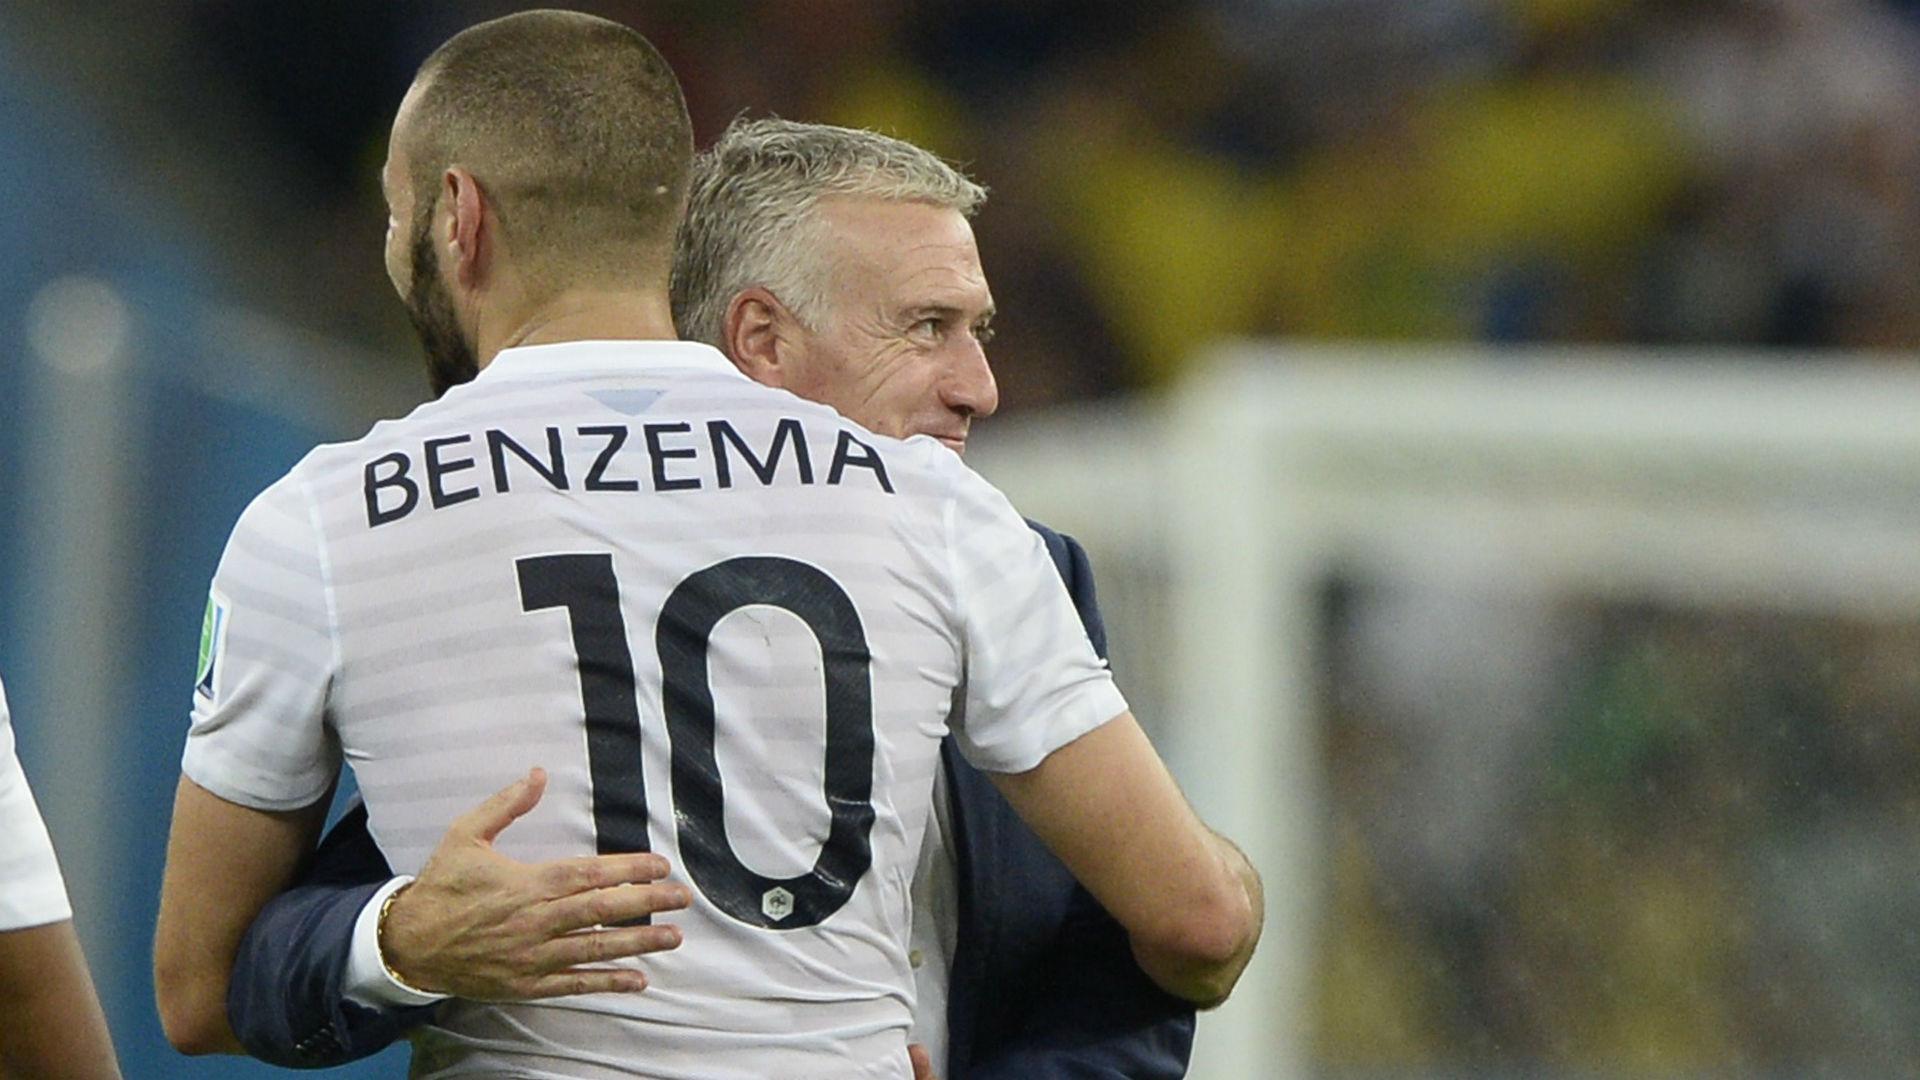 Benzema: